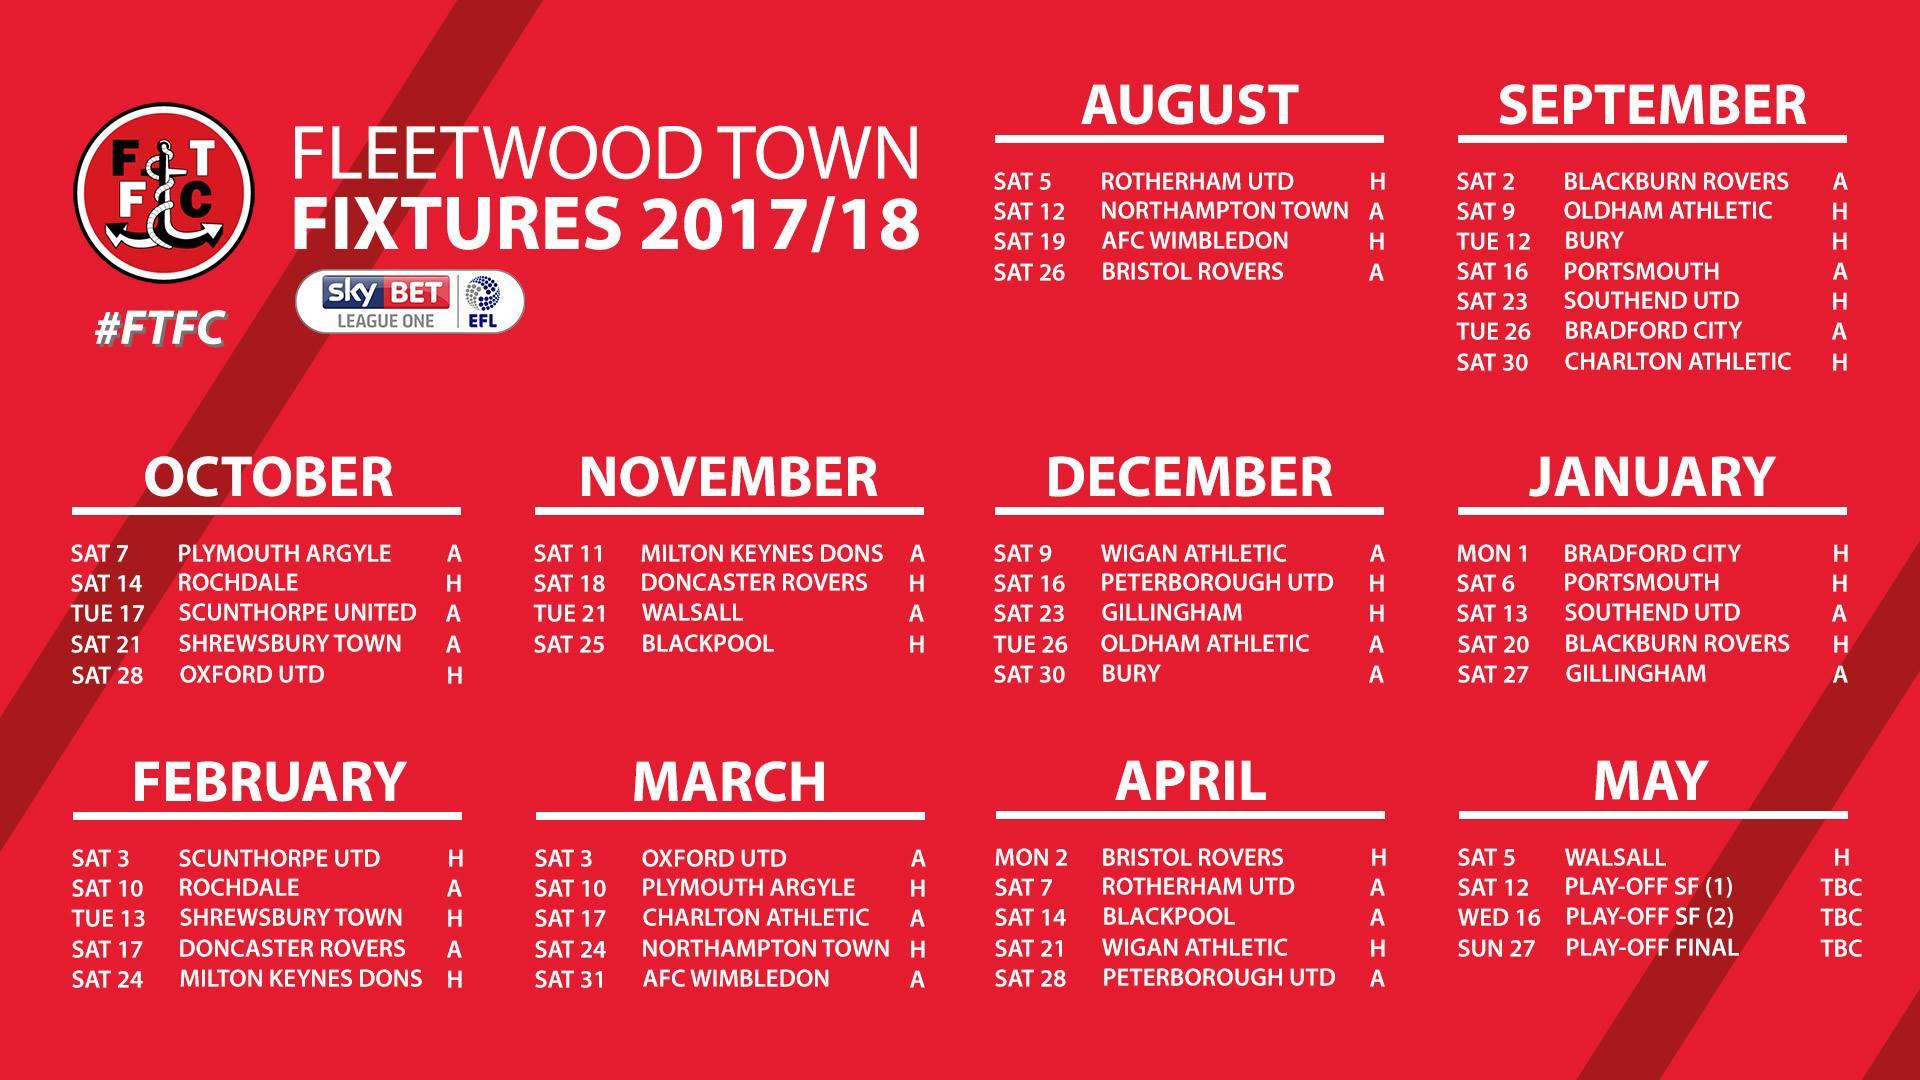 Fleetwood Town FC Fixtures for 2017/18